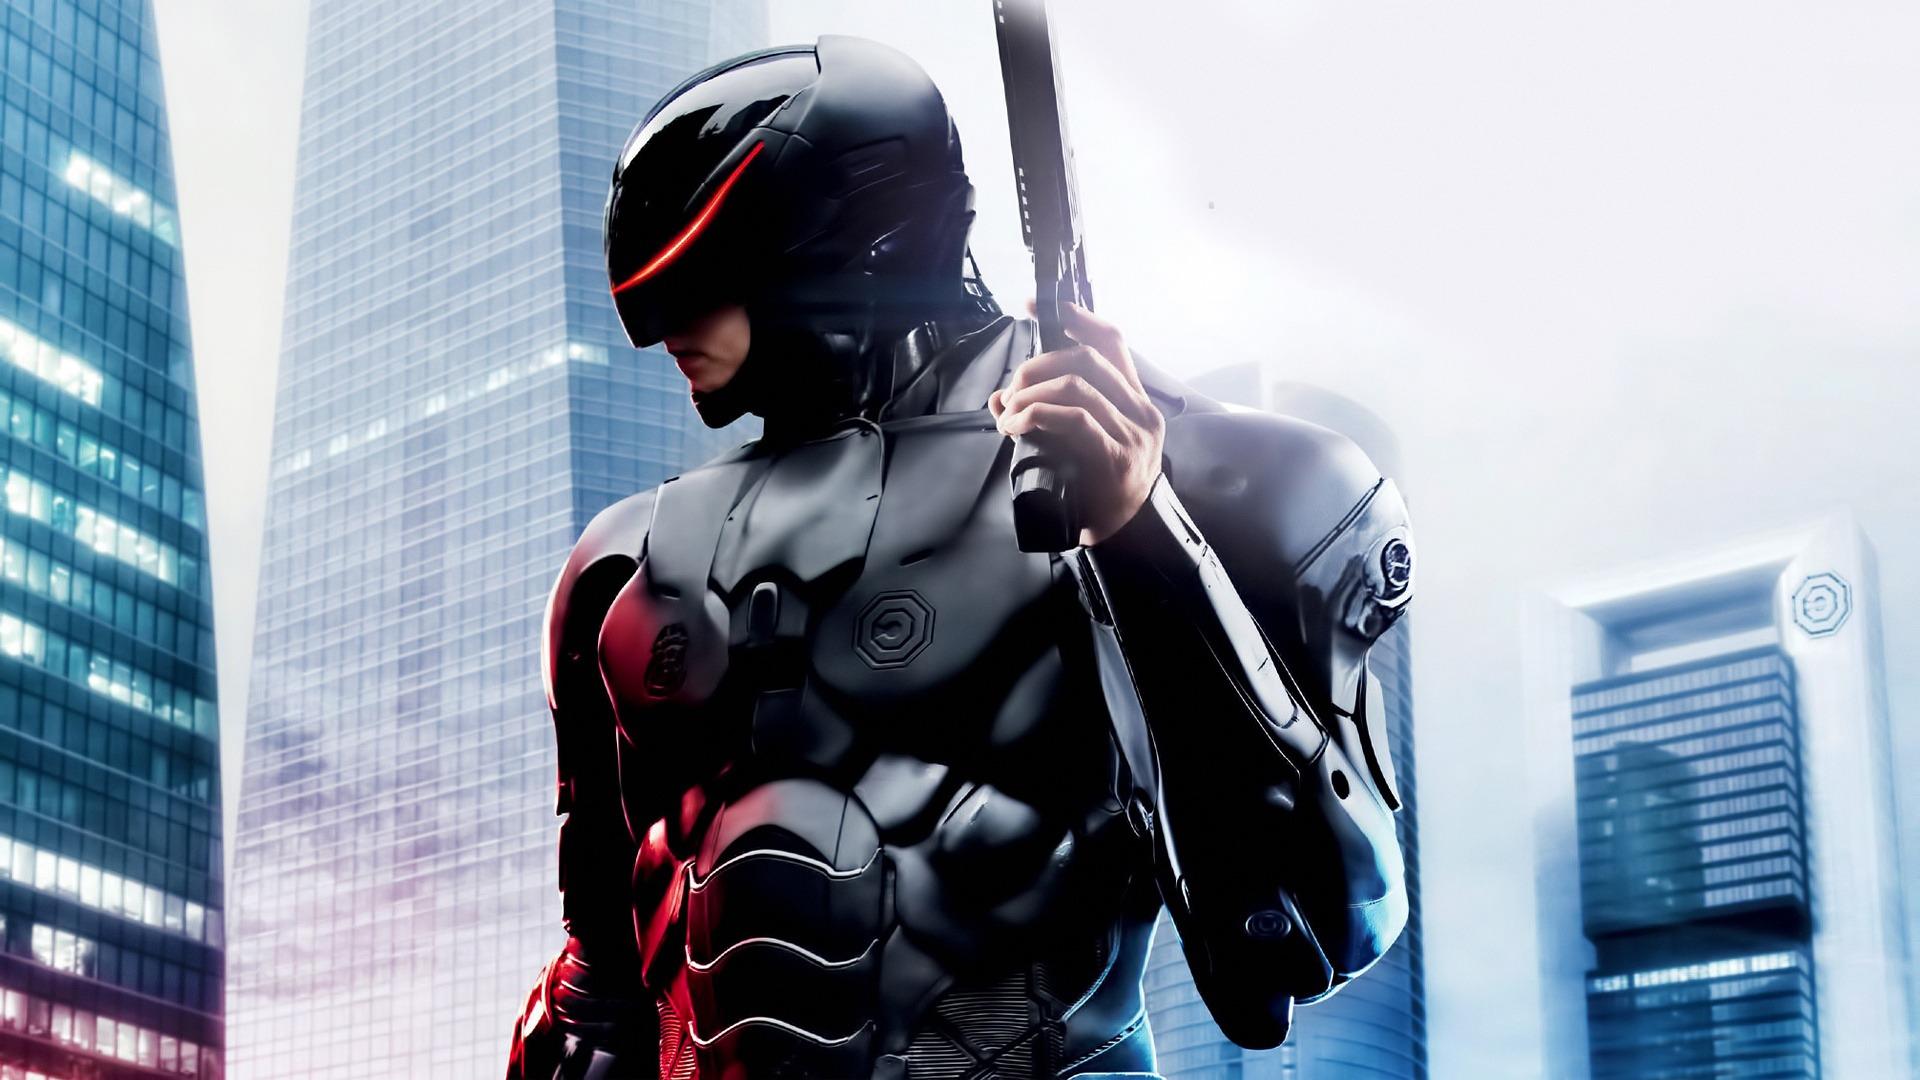 Robocop 2014 Main Review